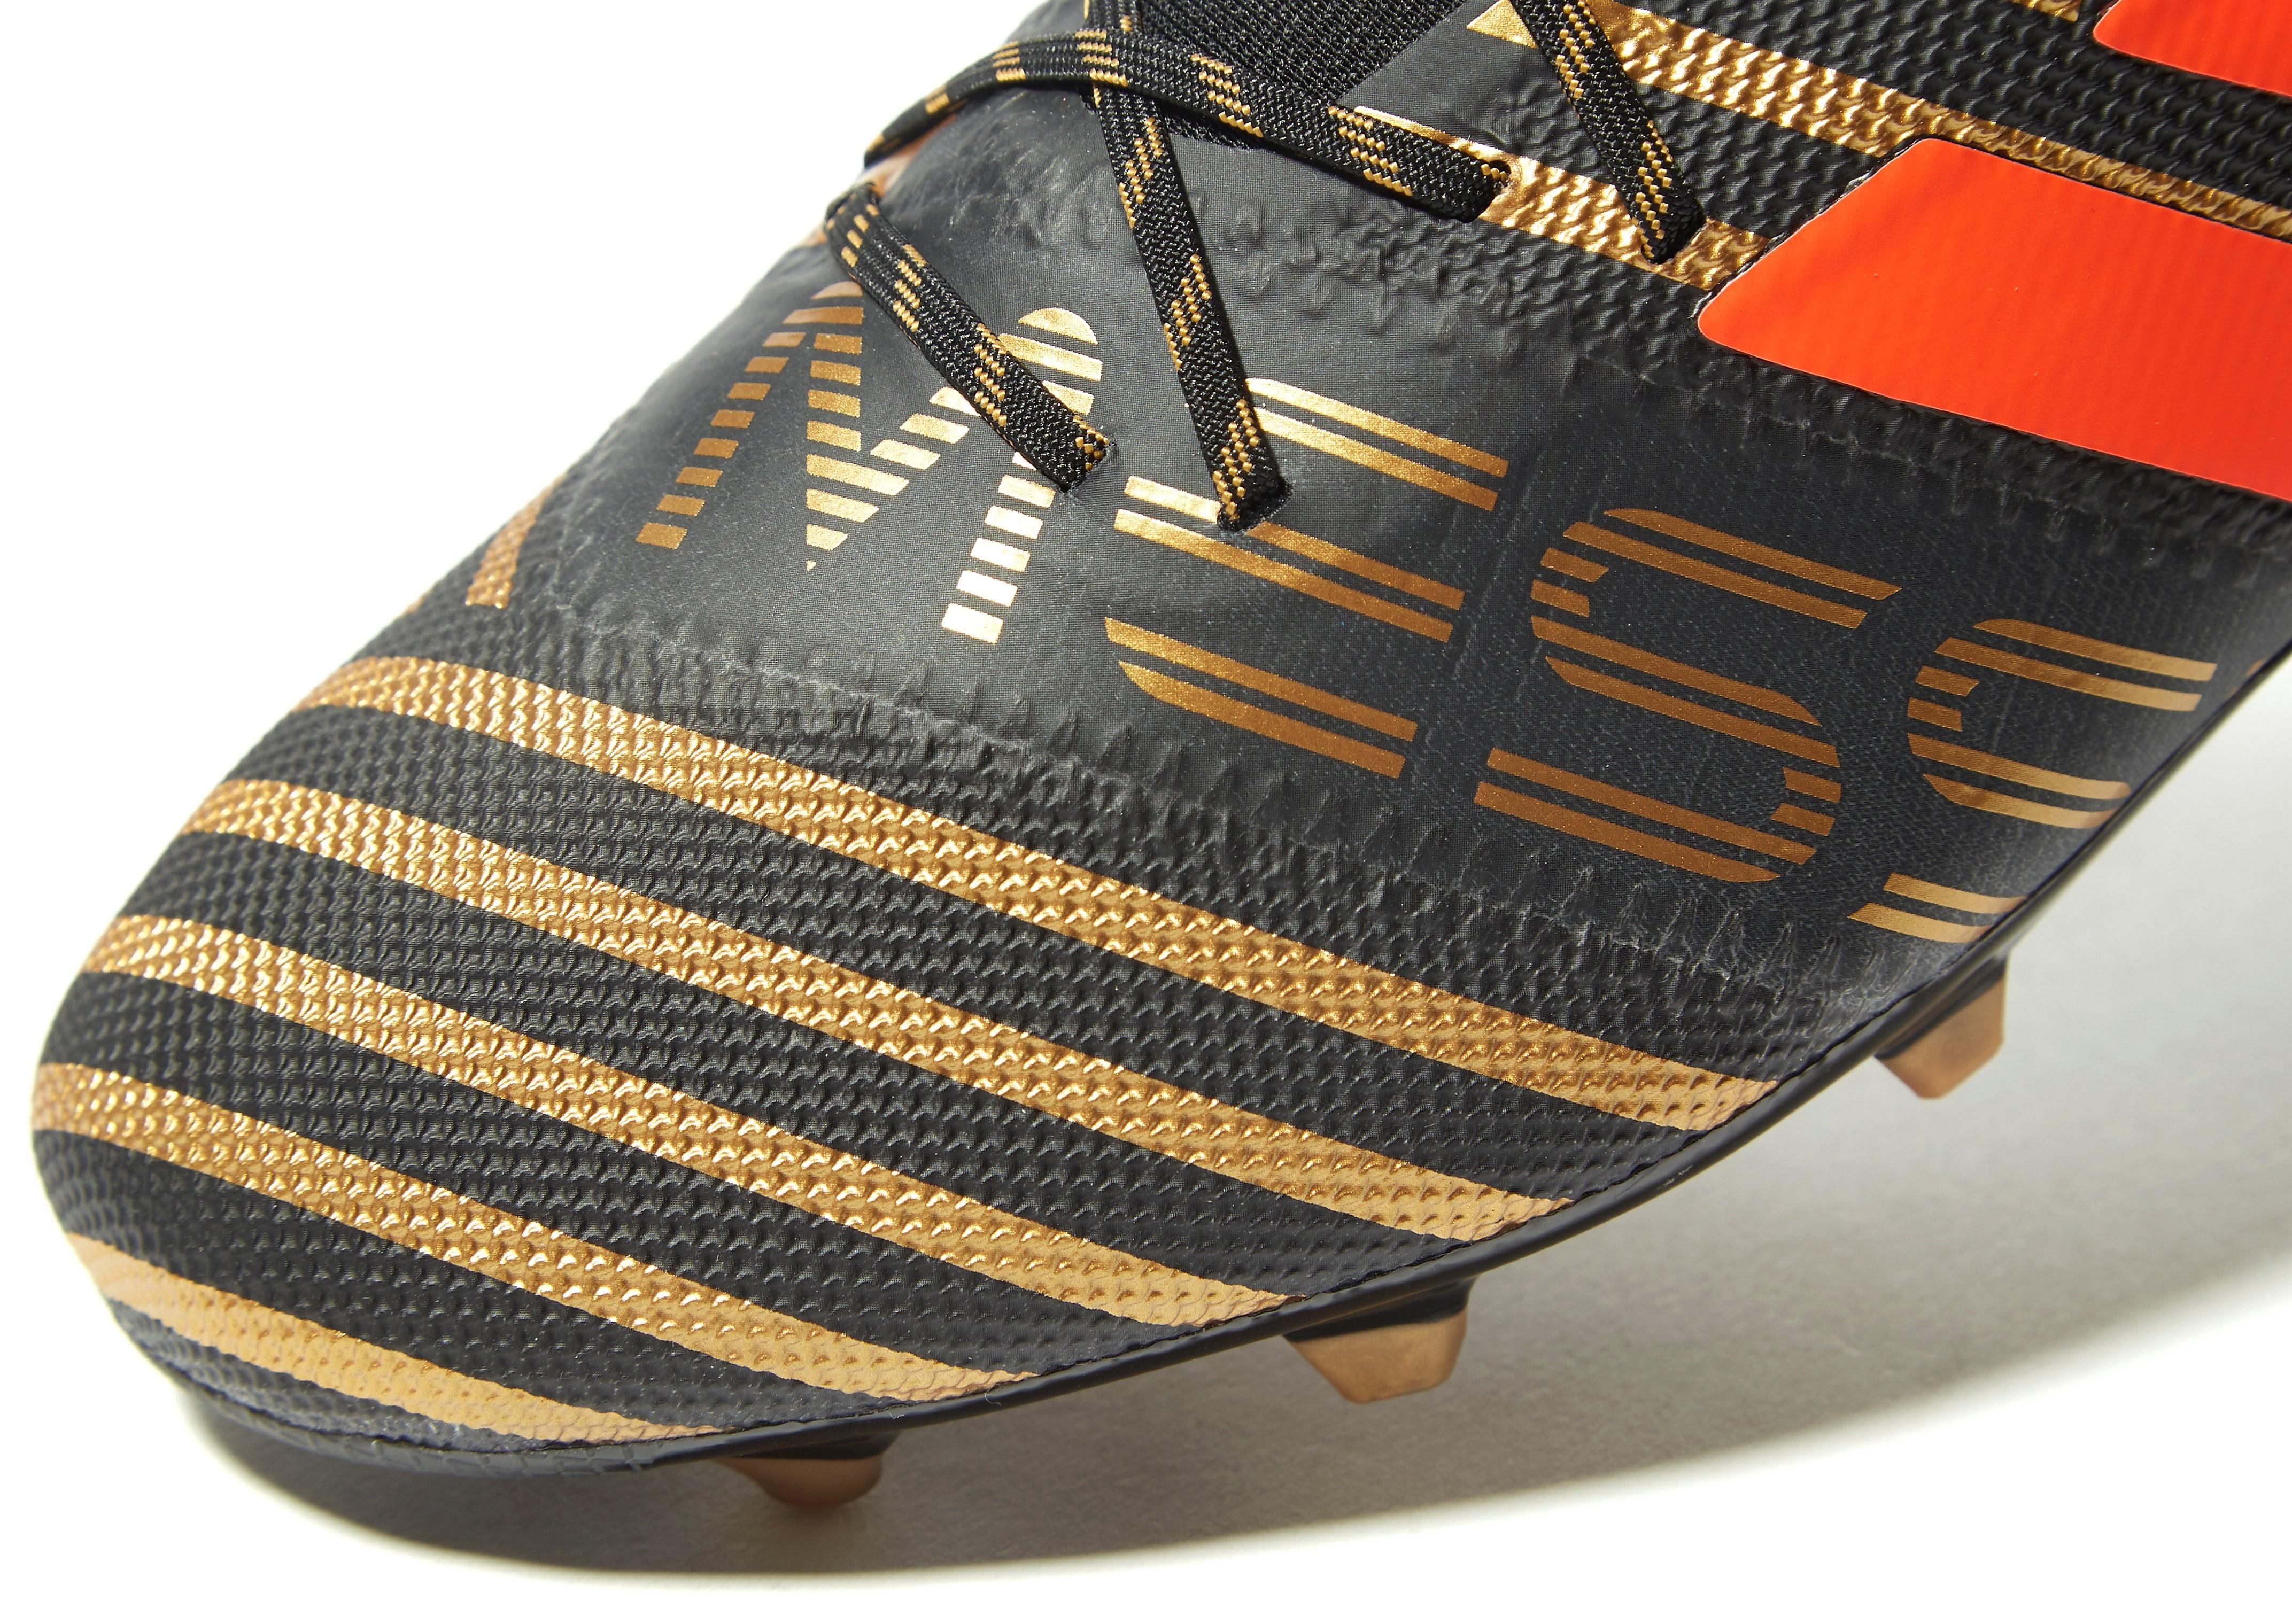 adidas SkyStalker Nemeziz Messi 17.2 FG